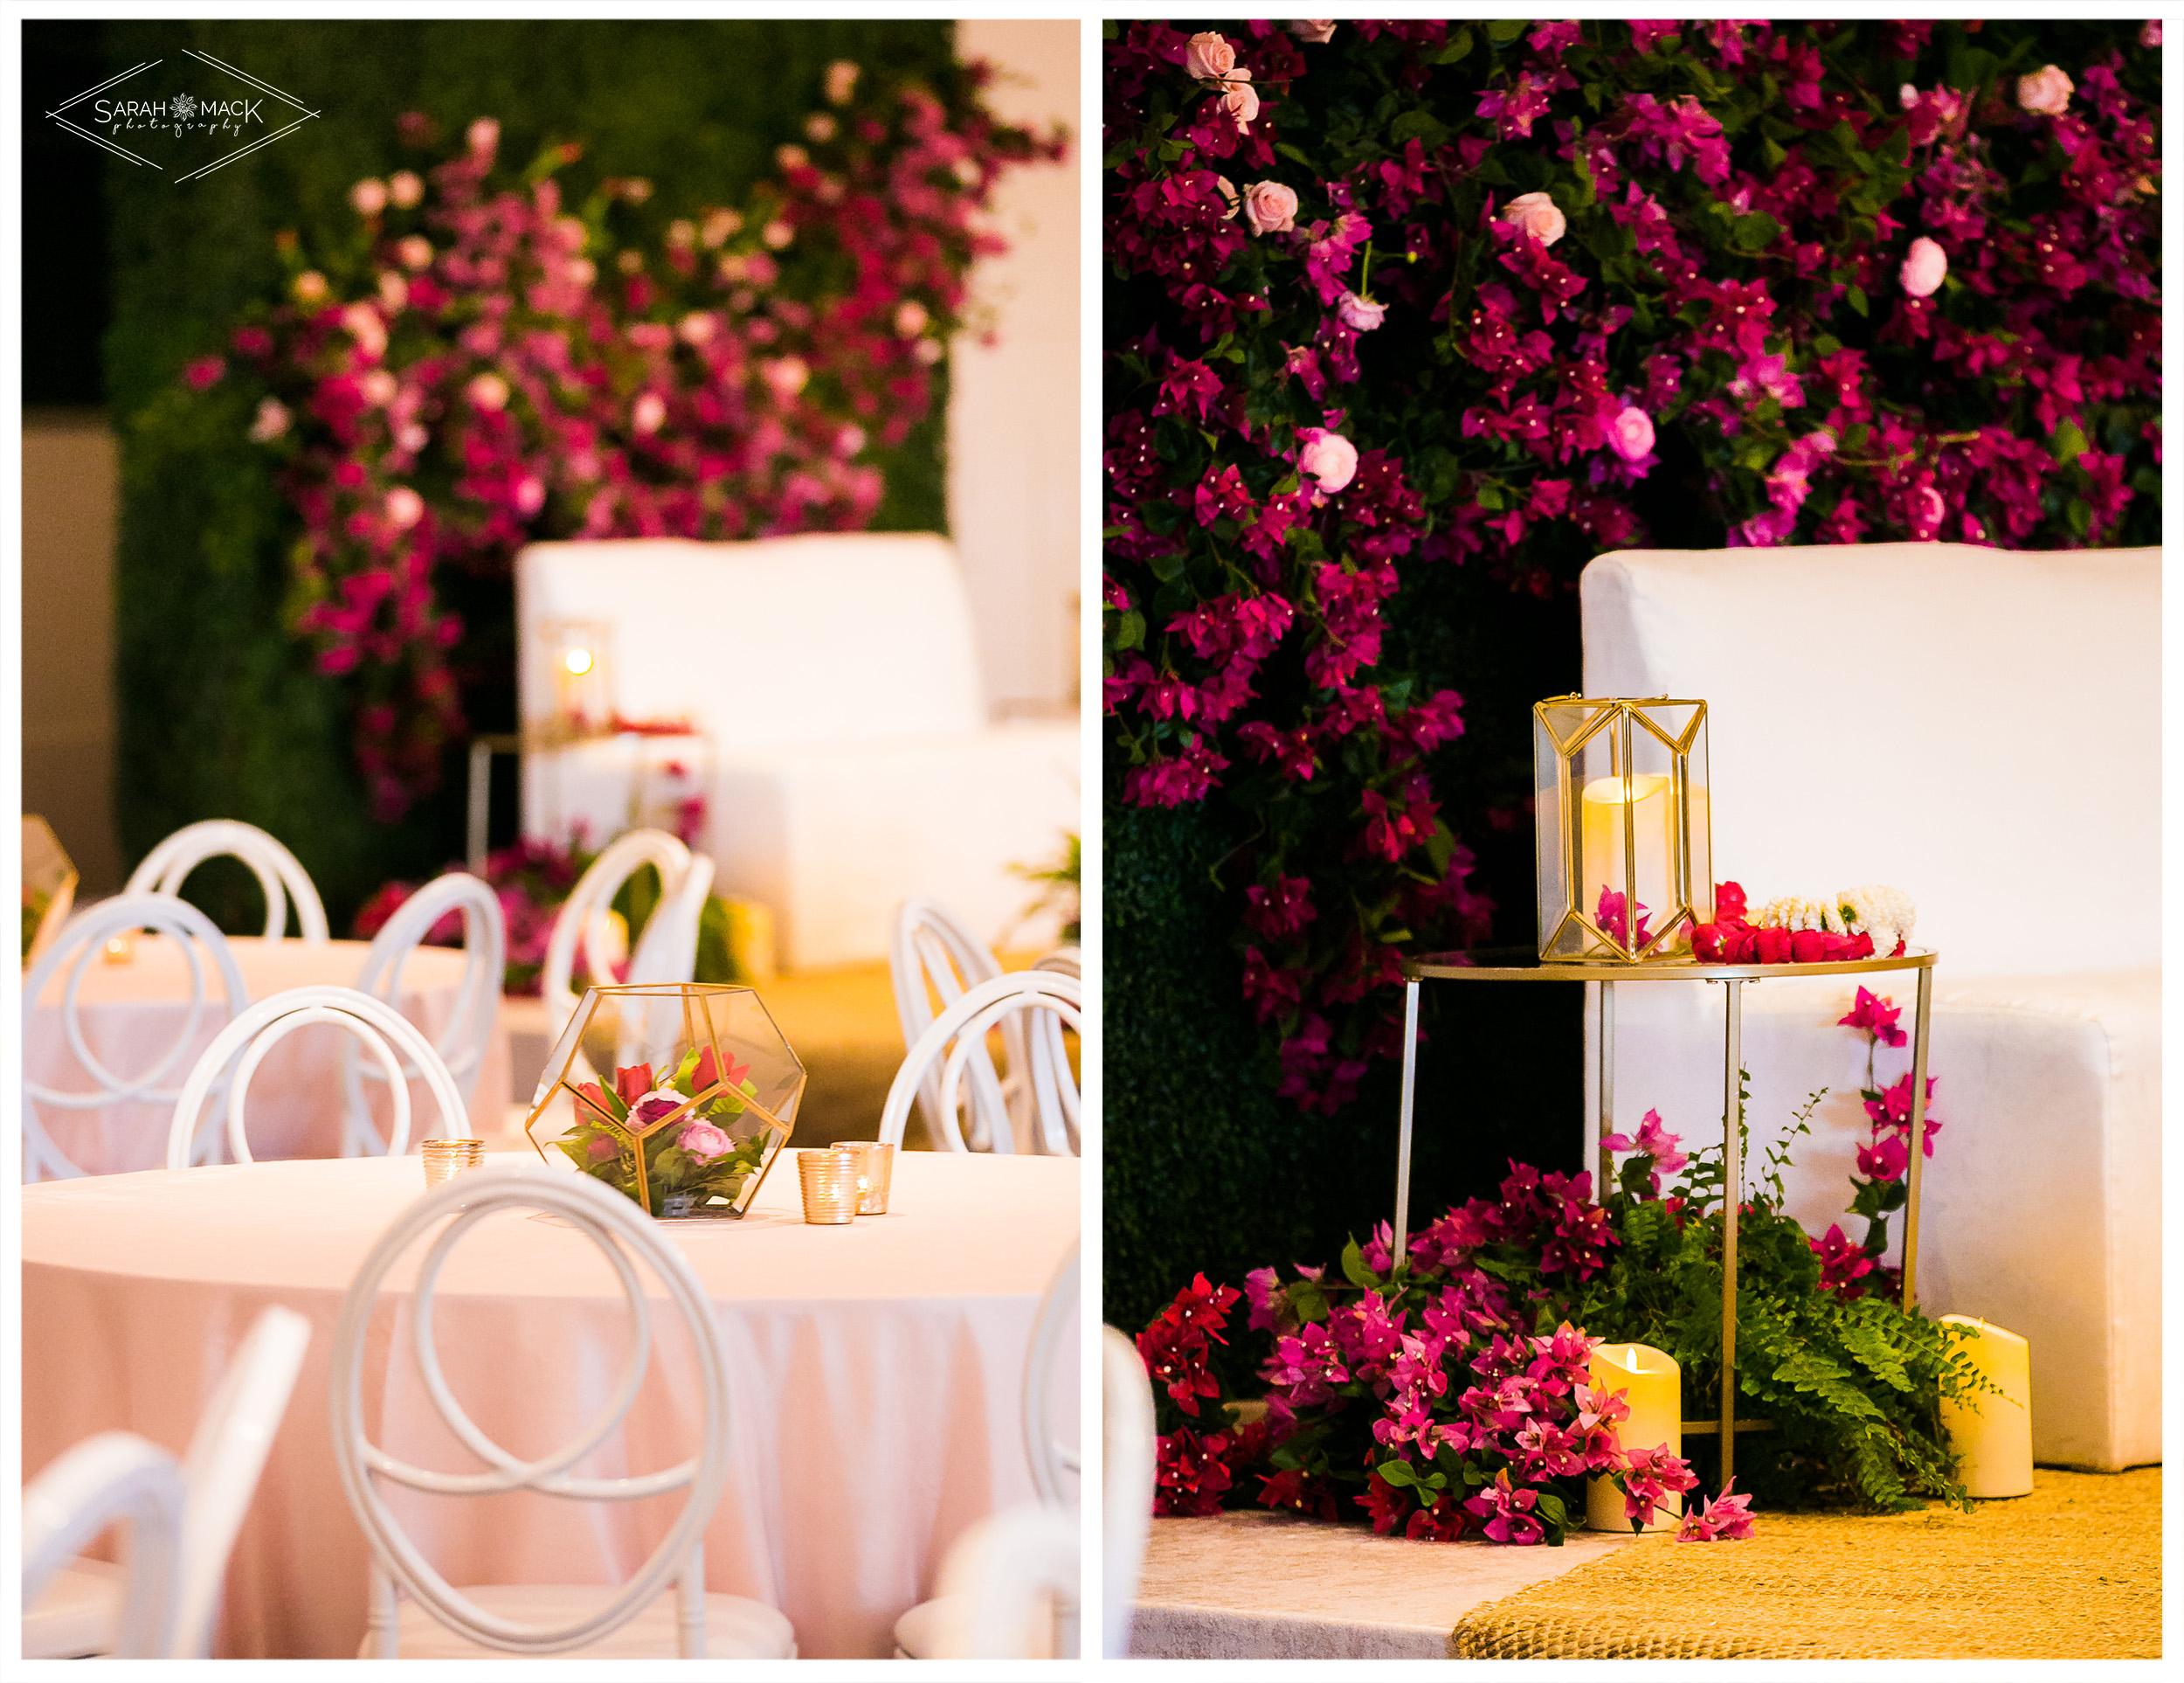 PR-Irvine-Ganesh-Pooja-Indian-Wedding-Photography-11.jpg